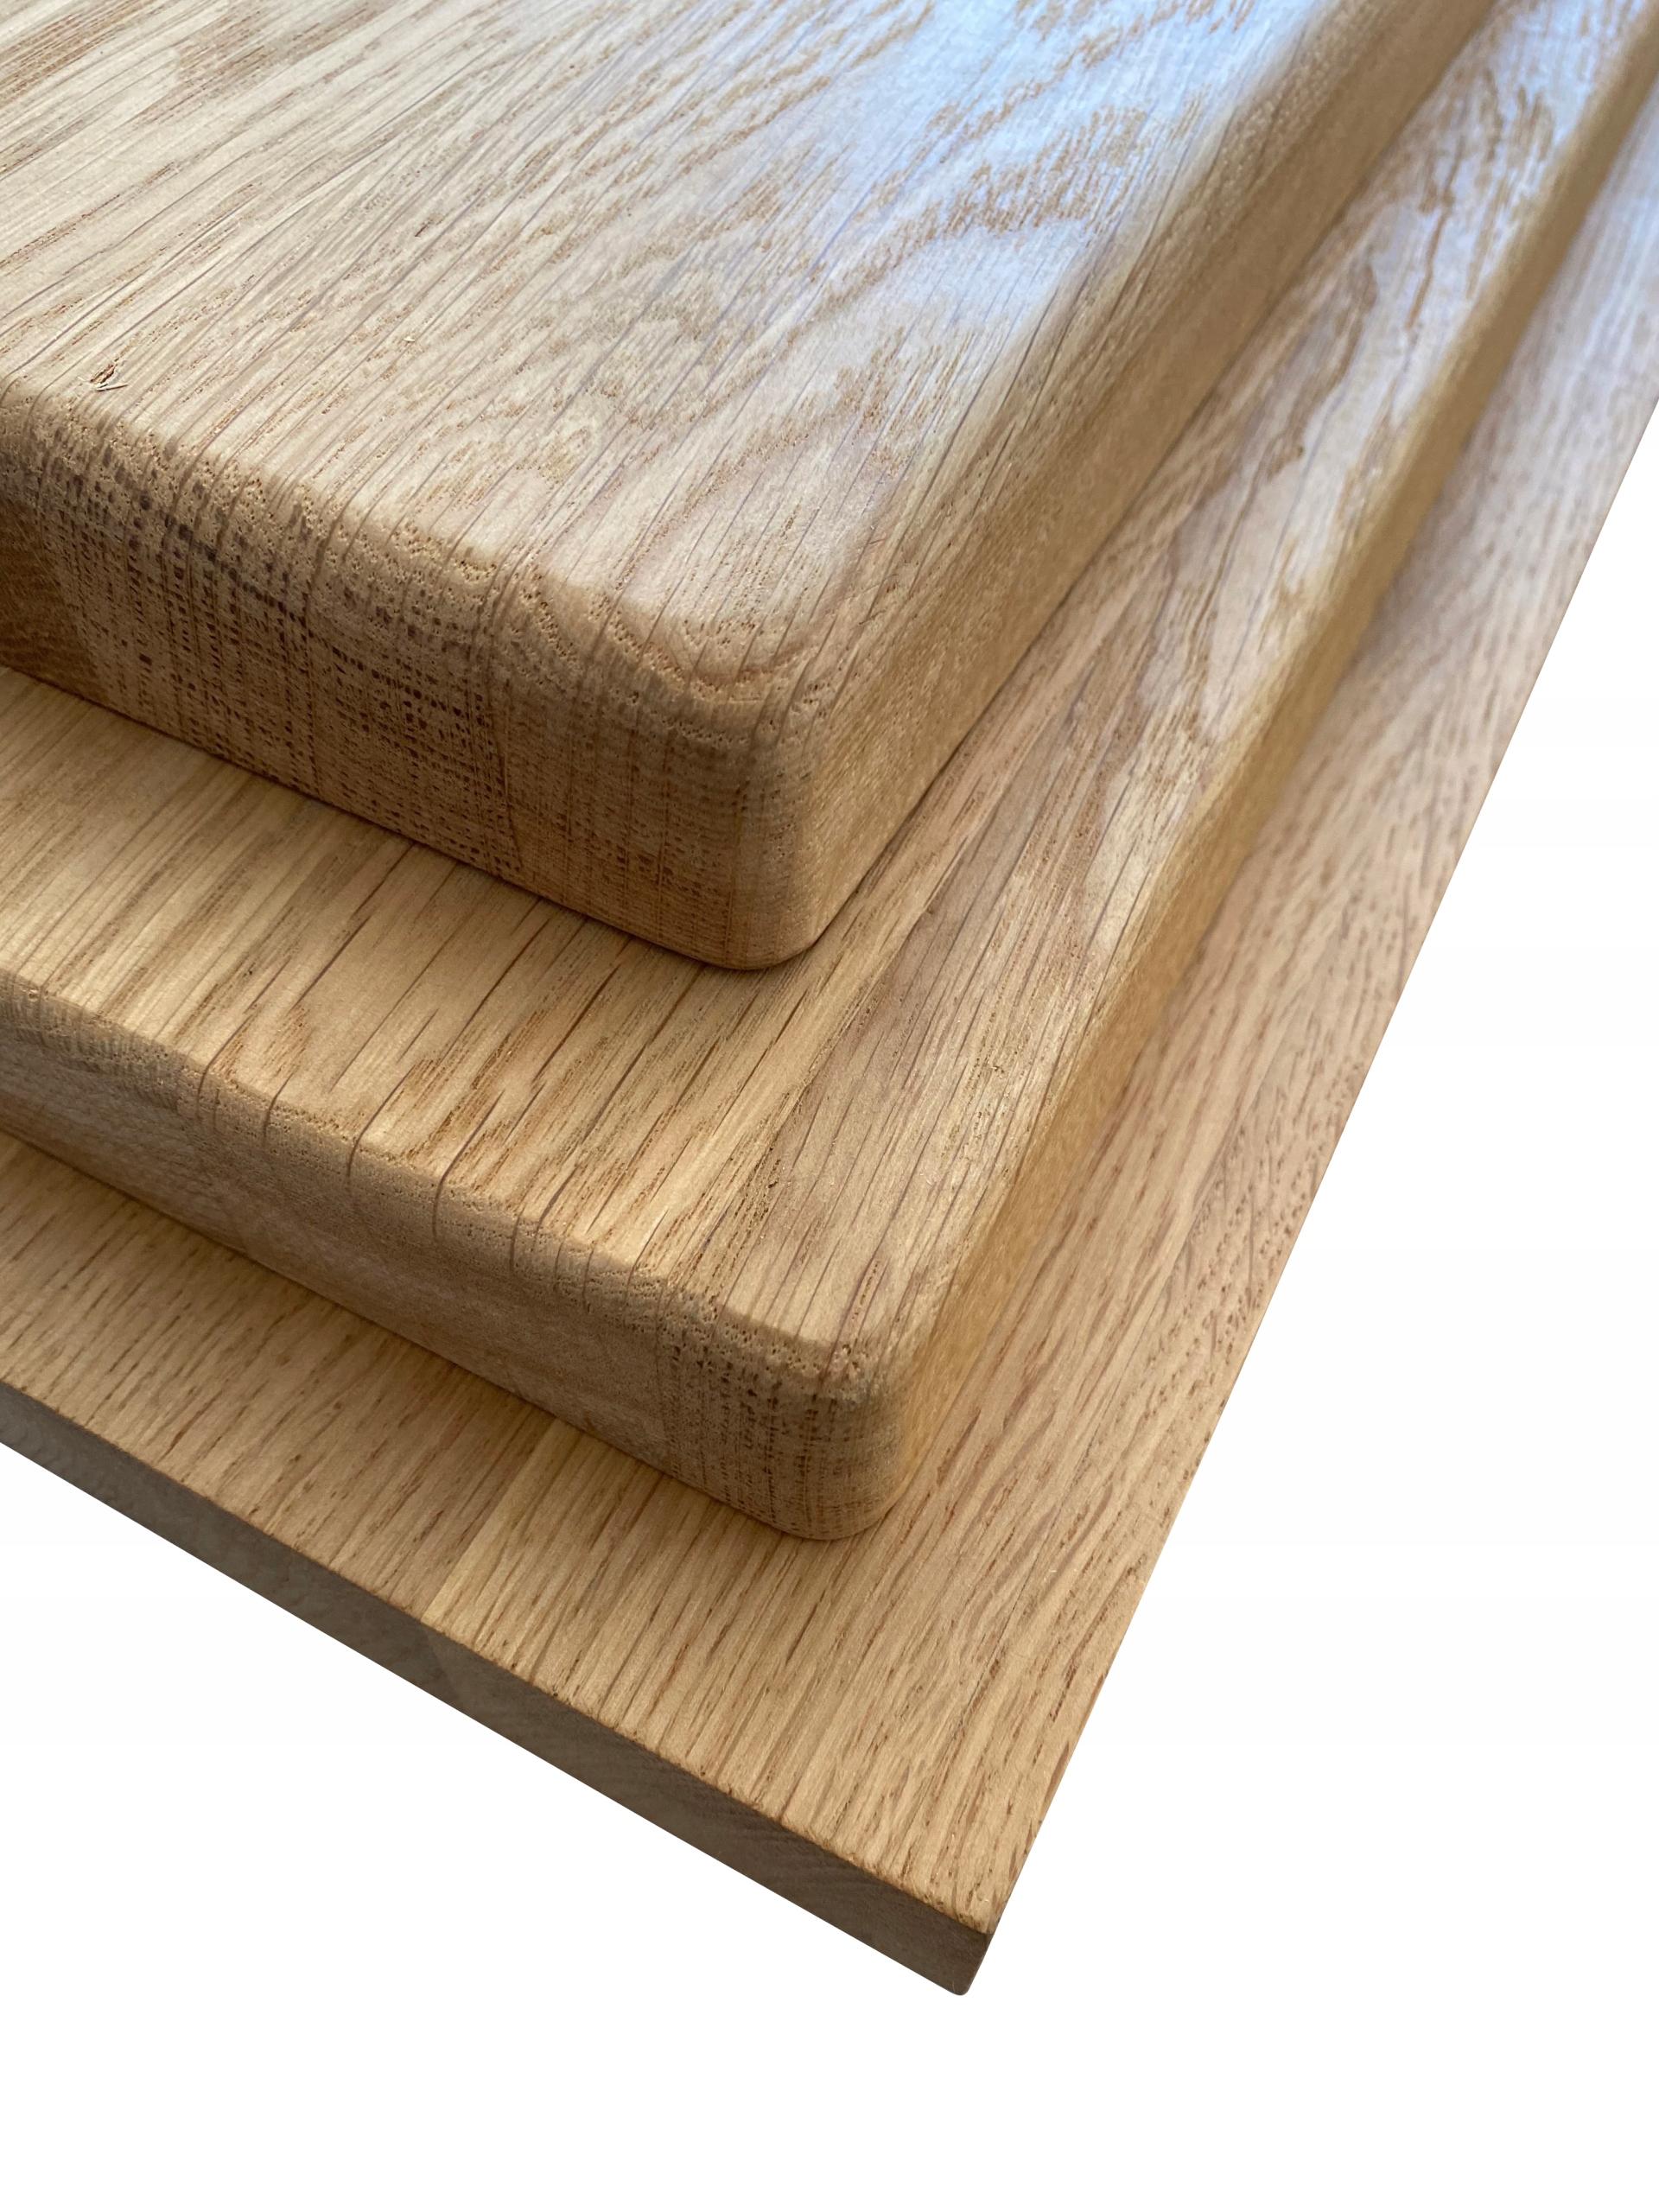 Drewniany Parapet Dab Bez Sekow 100x22cm Gr 2 Cm 9338920281 Allegro Pl